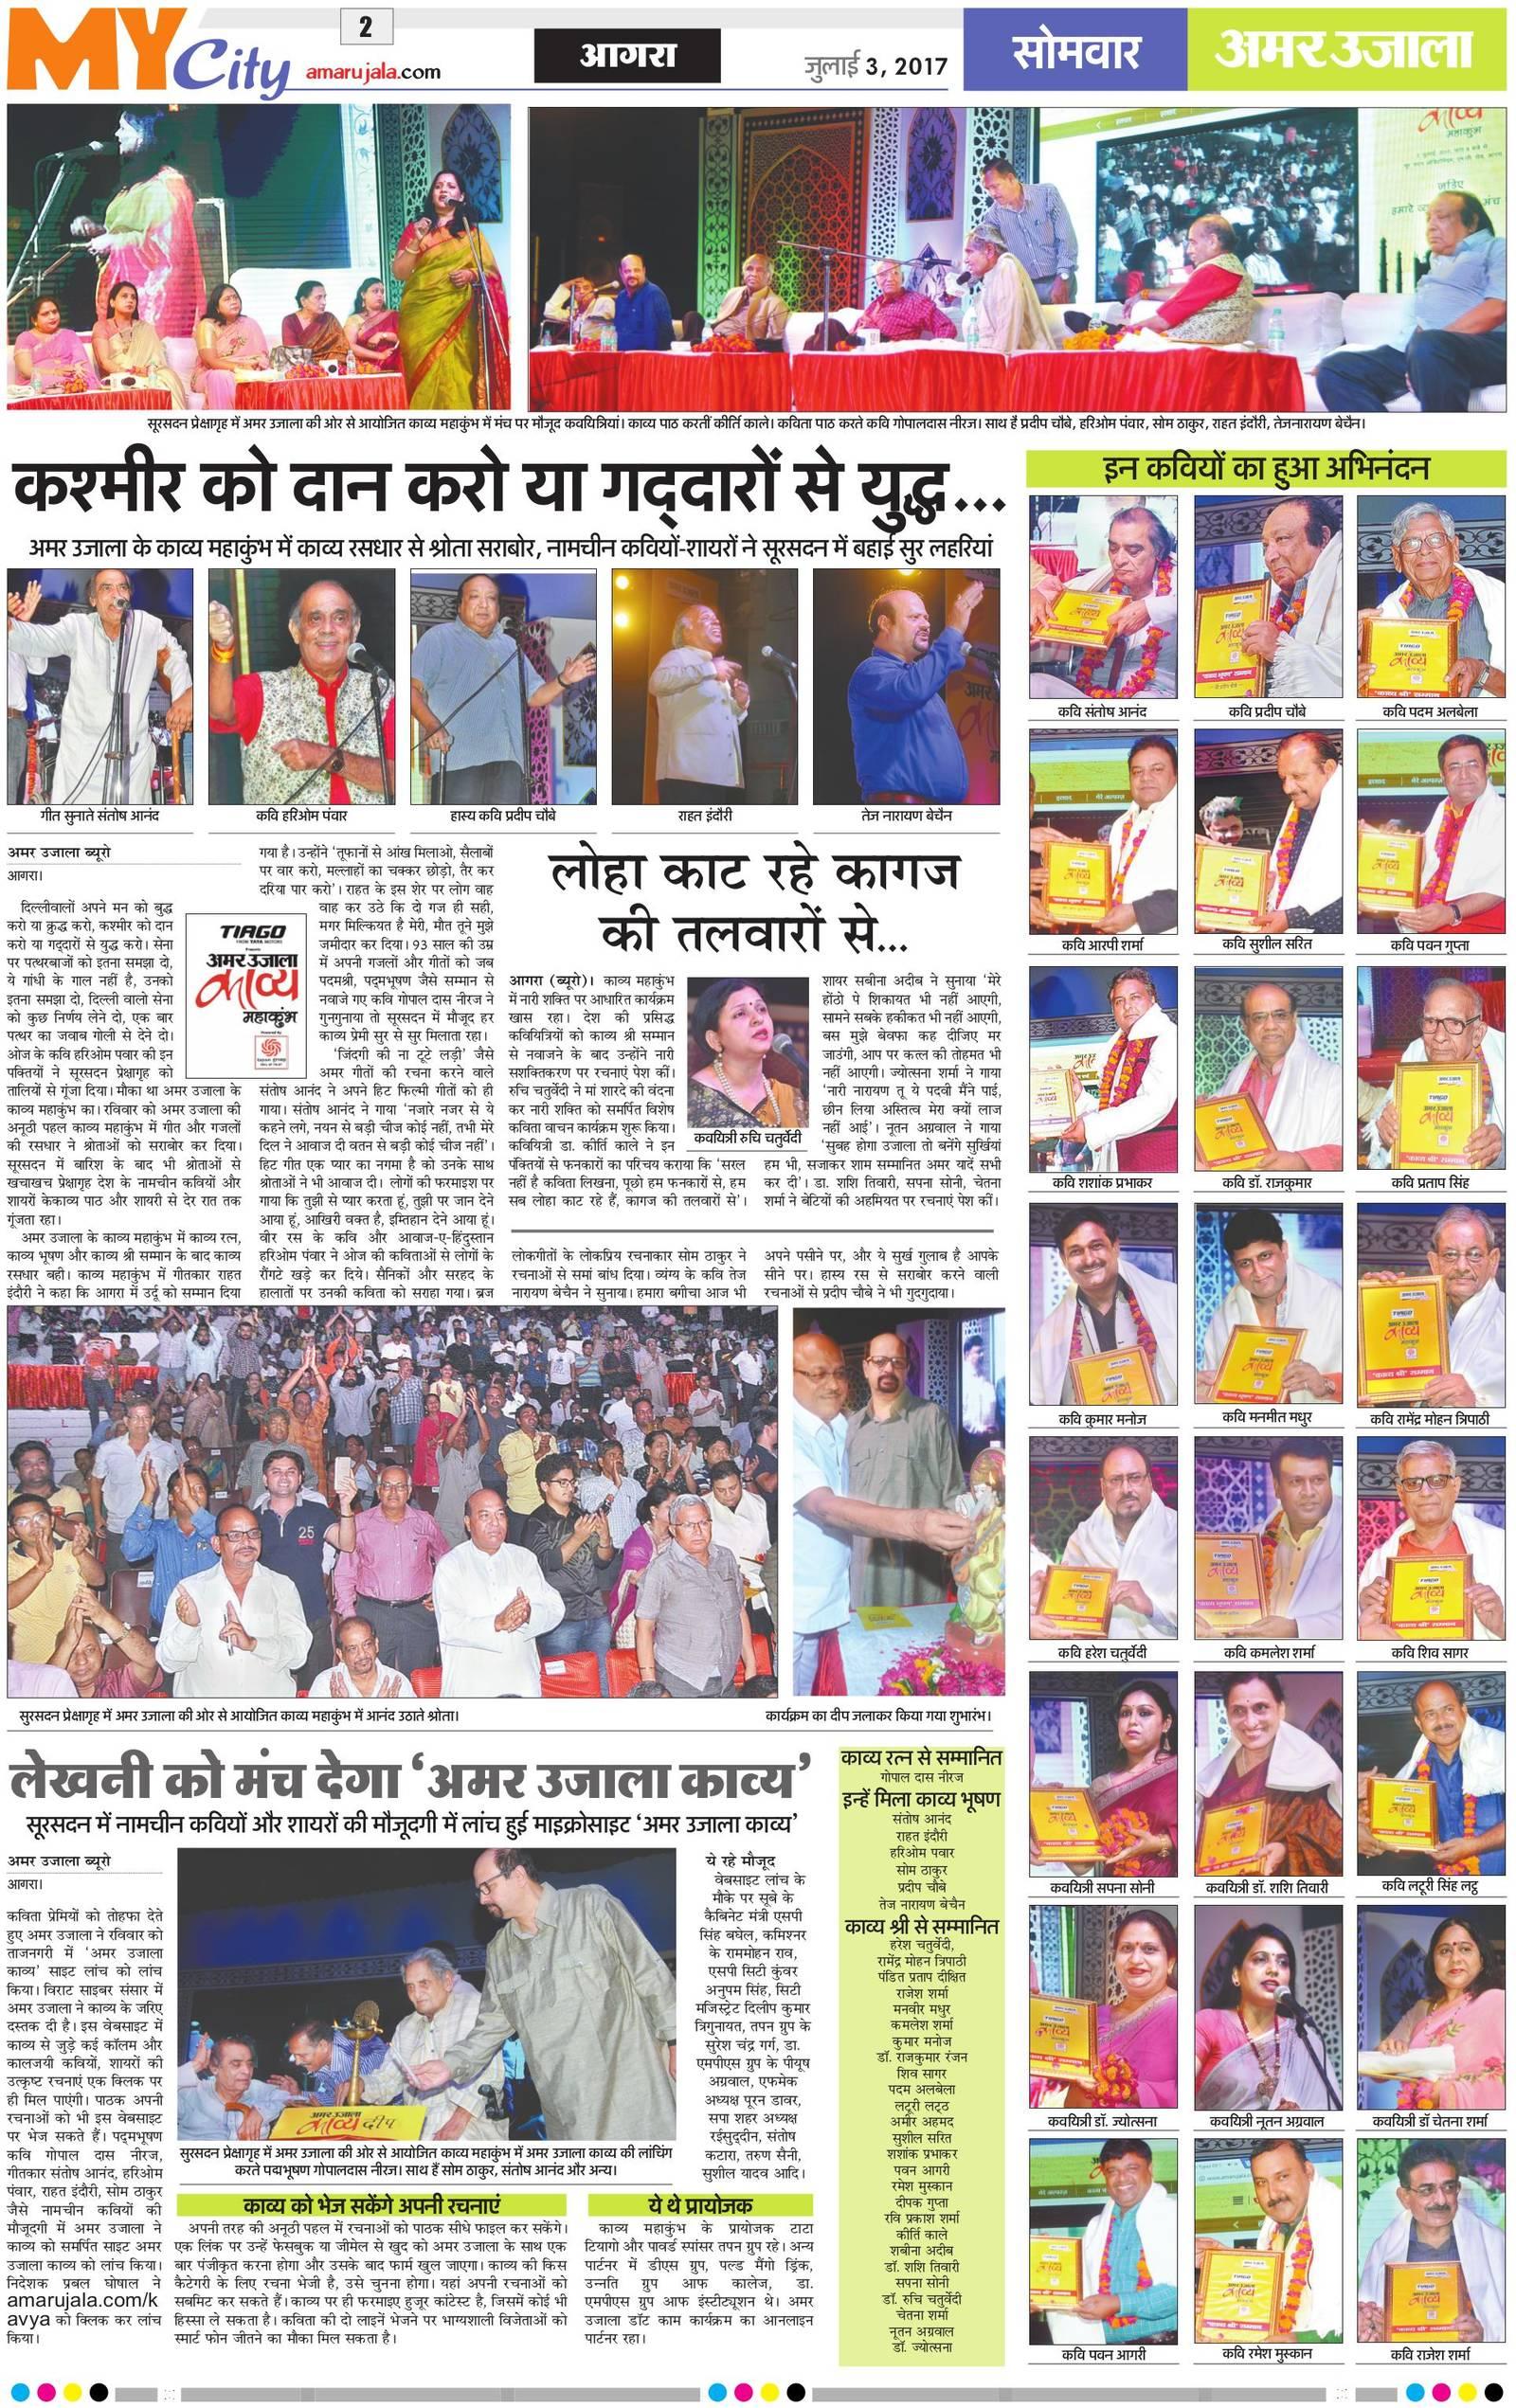 Inma Best Practice Amar Ujala S Multi Platform Kavya Taps Into Massive Hindi Poetry Subculture